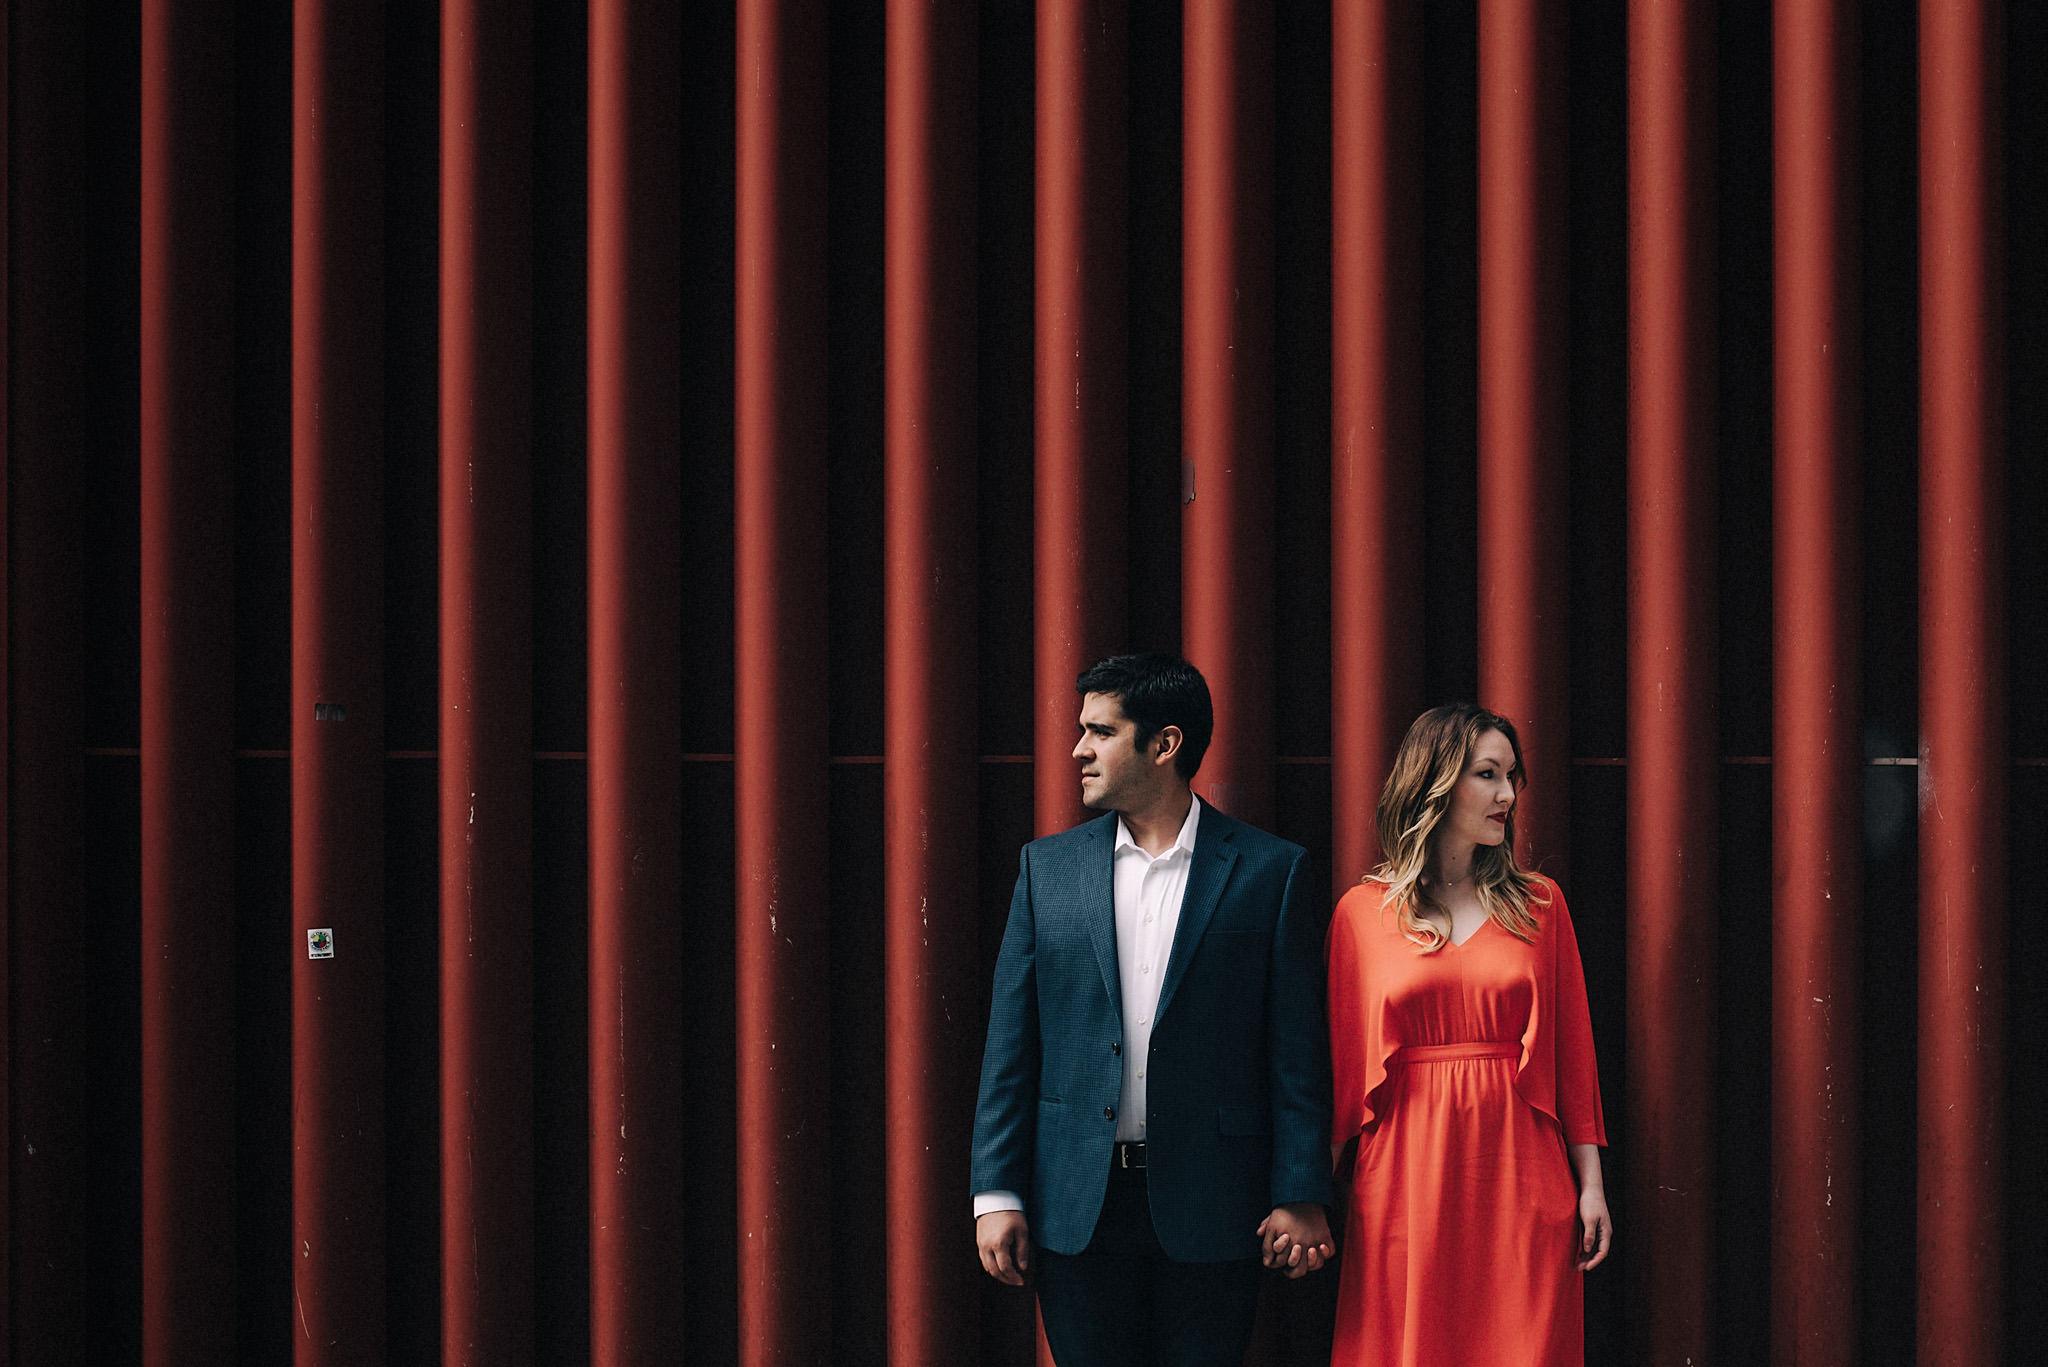 New-York-Photographer-NY-1-Bride-Mother-Candid-Felipe-Carranza